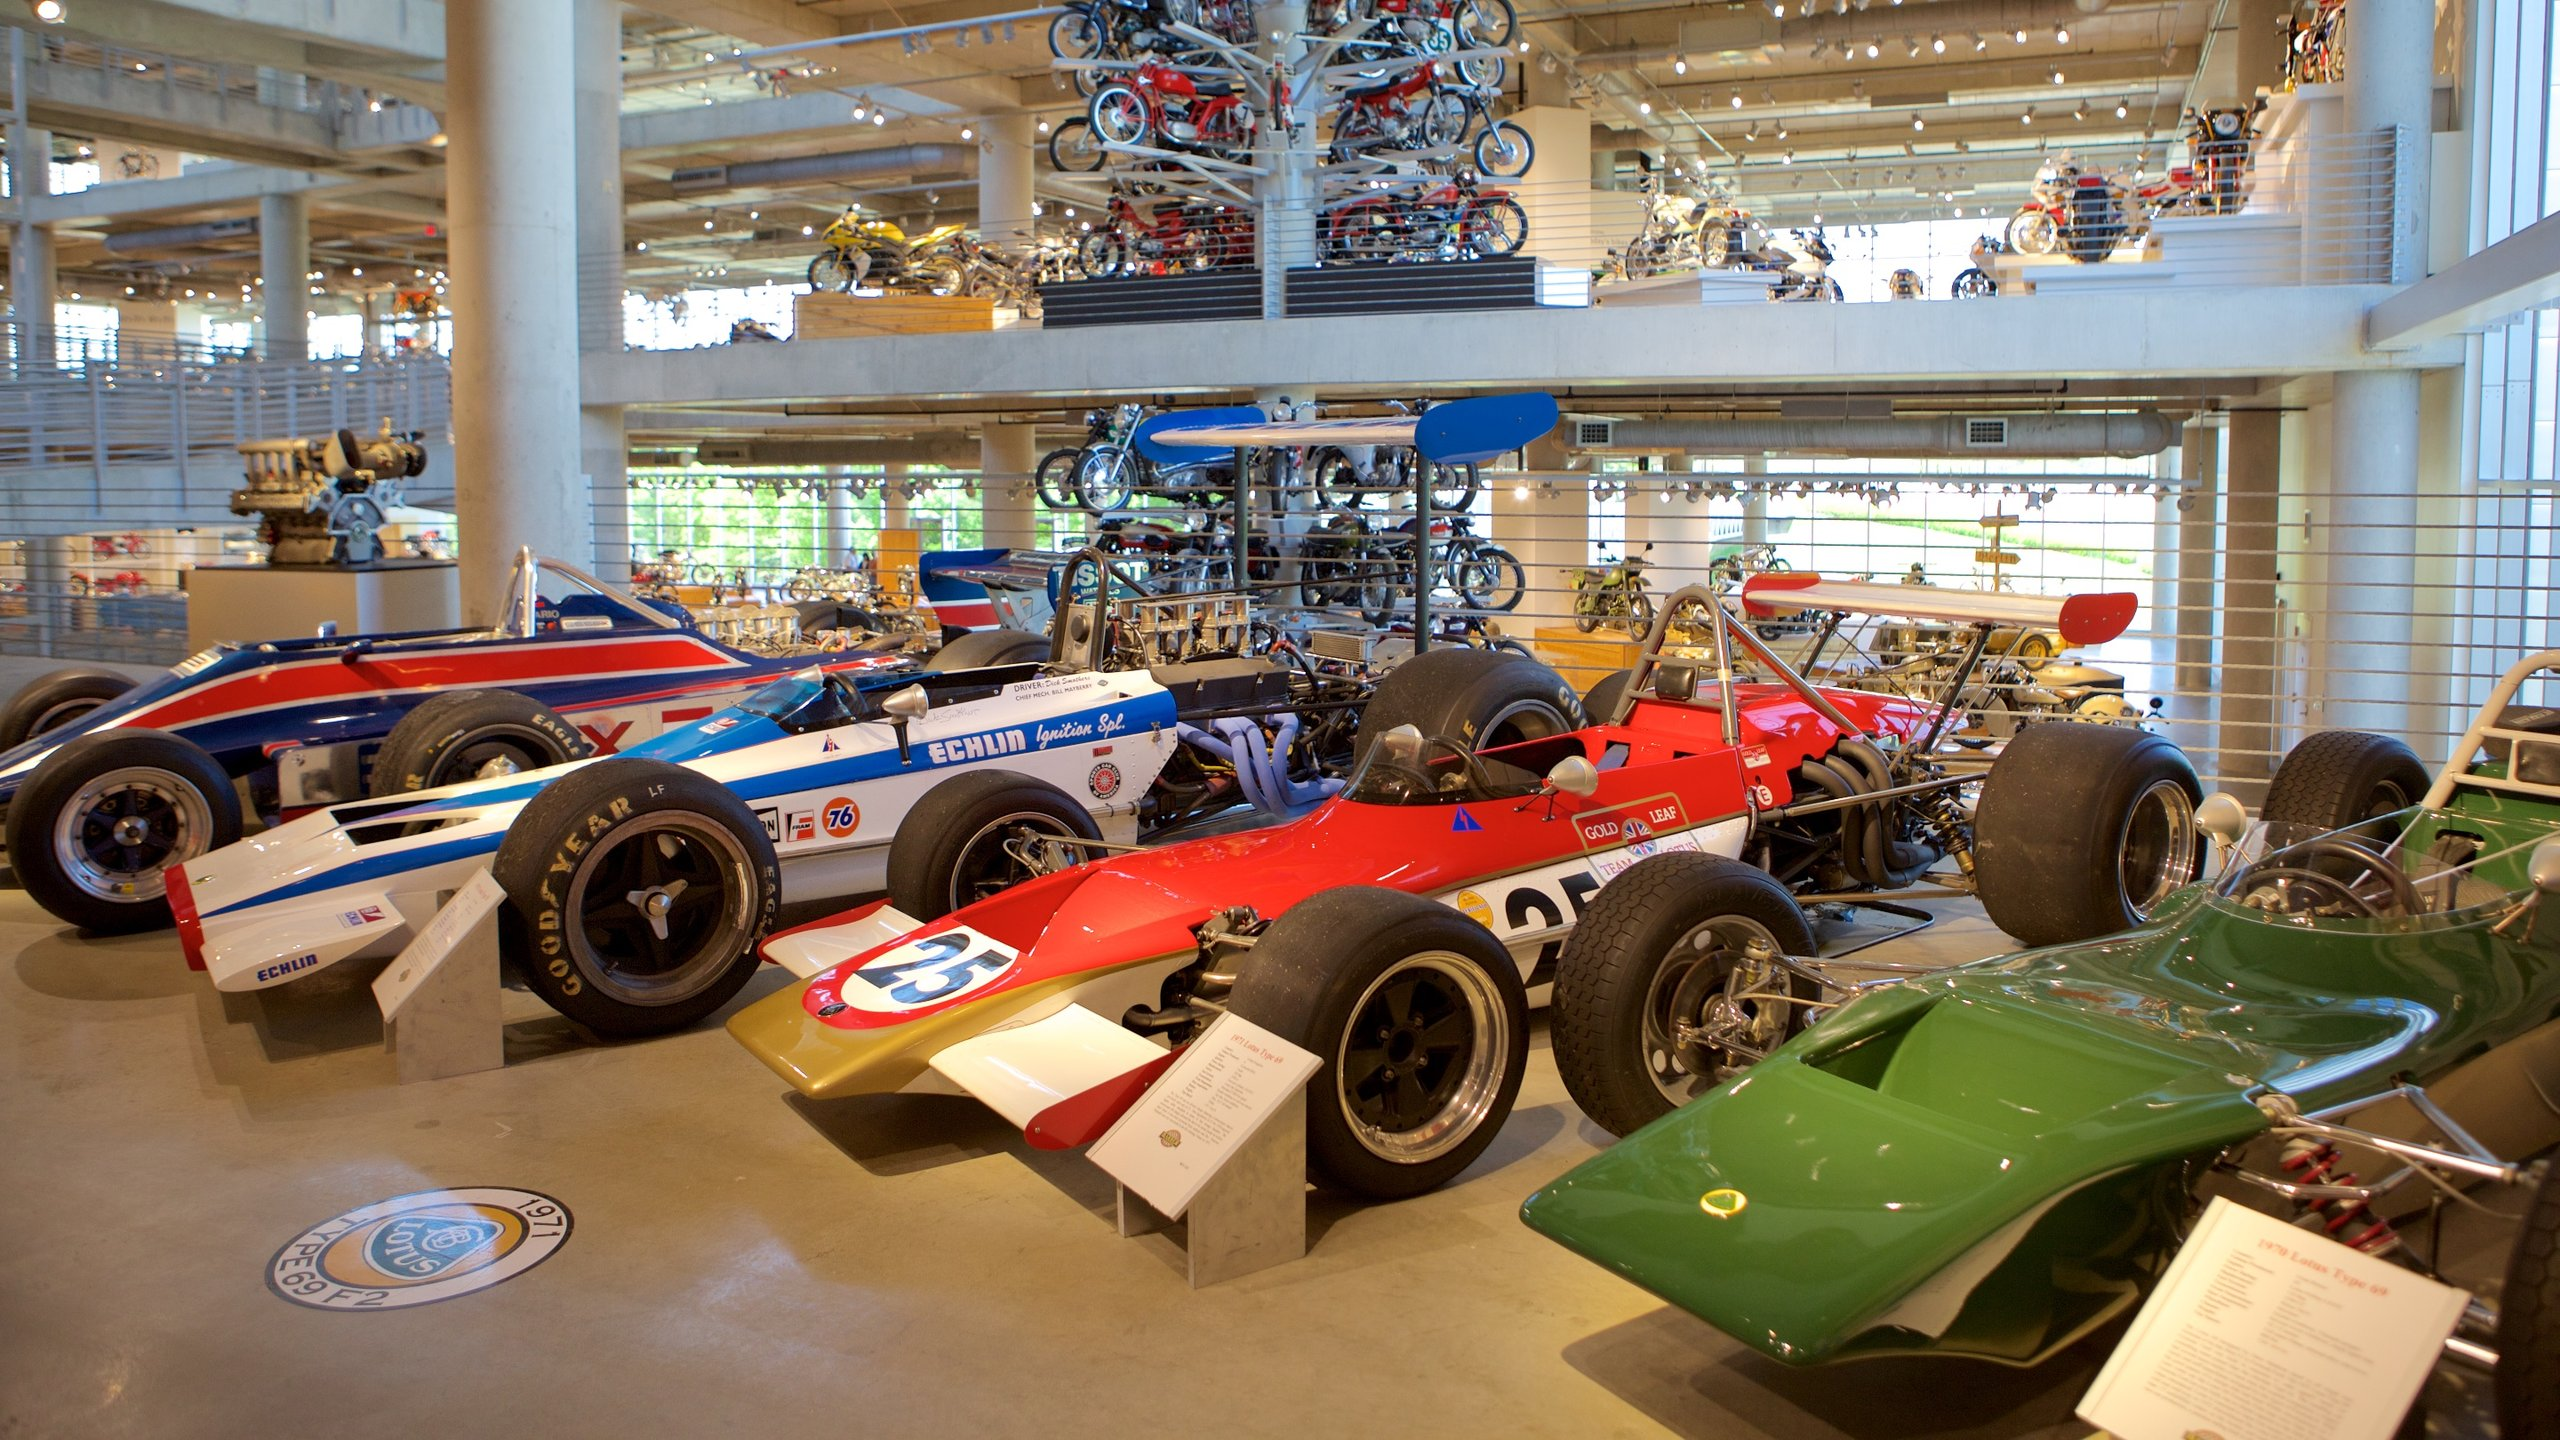 Barber Motorsports Park >> 10 Best Hotels Closest To Barber Motorsports Park In